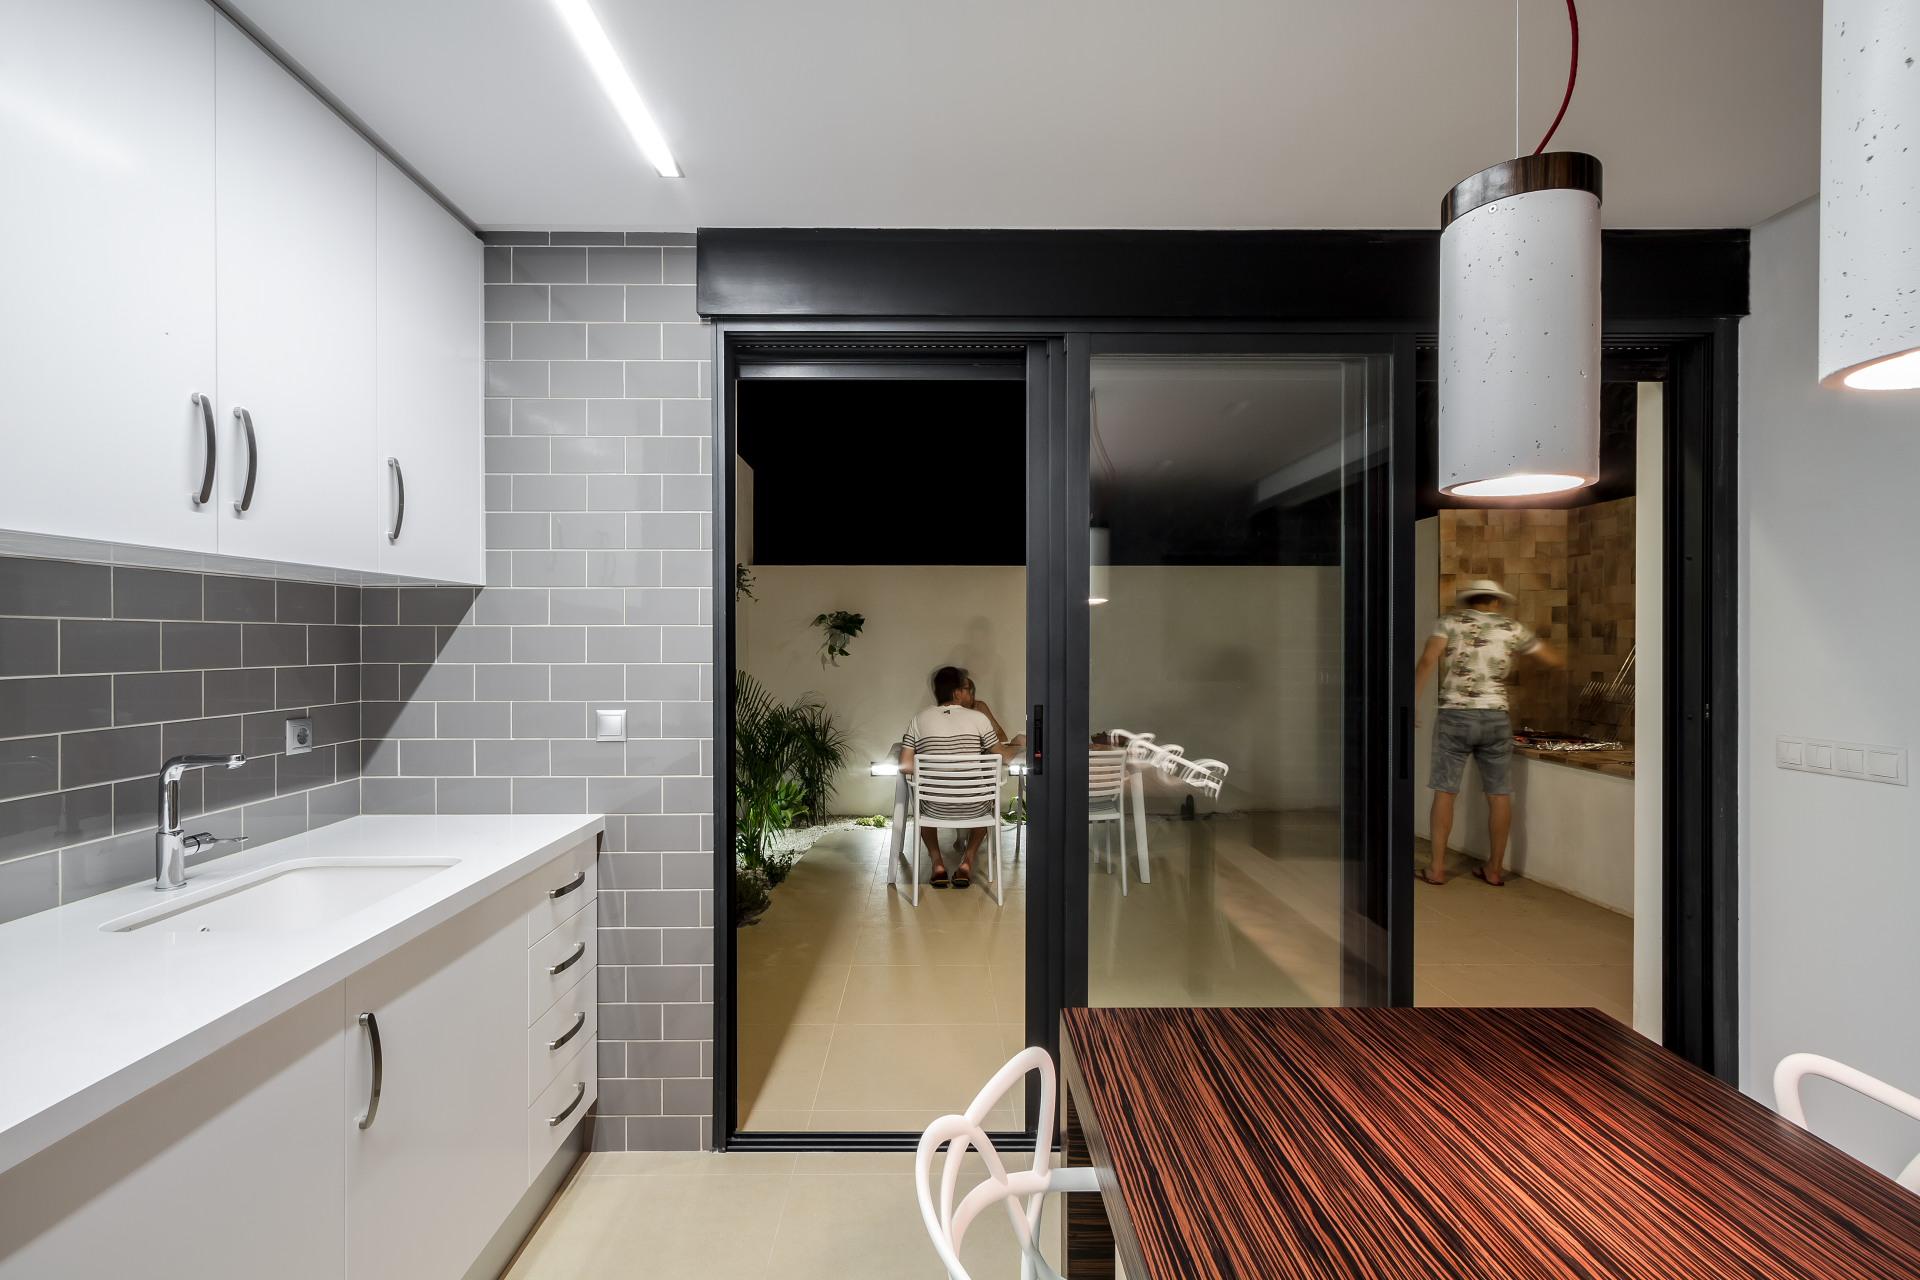 fotografia-arquitectura-valencia-german-cabo-selecta-home-denia (21)